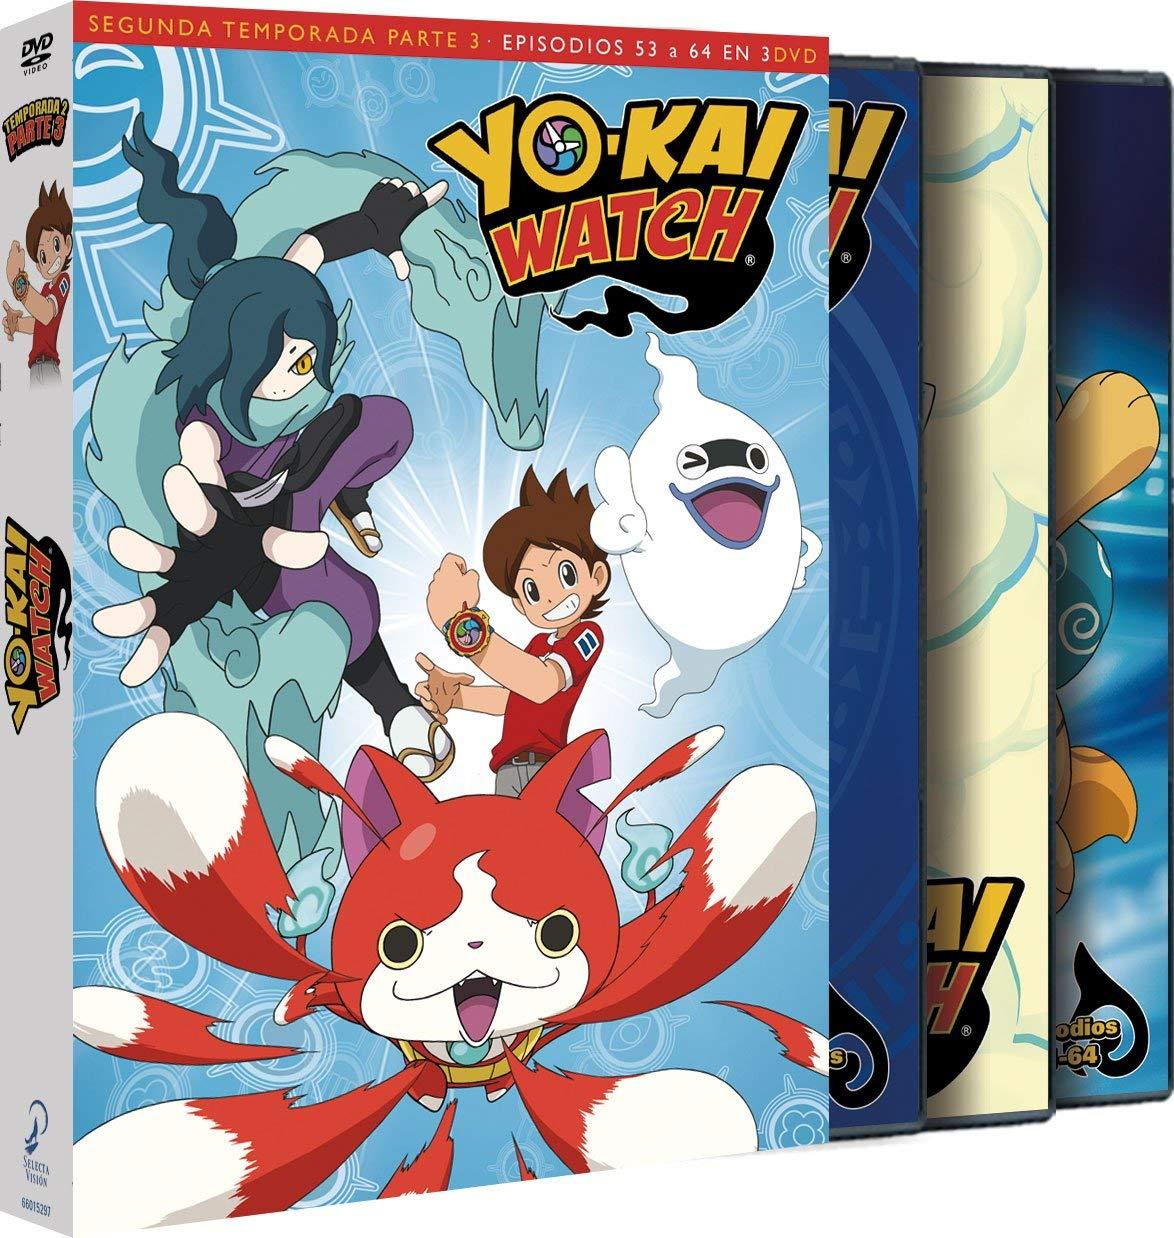 DVD YOKAI WATCH TEMP 2 PARTE 3